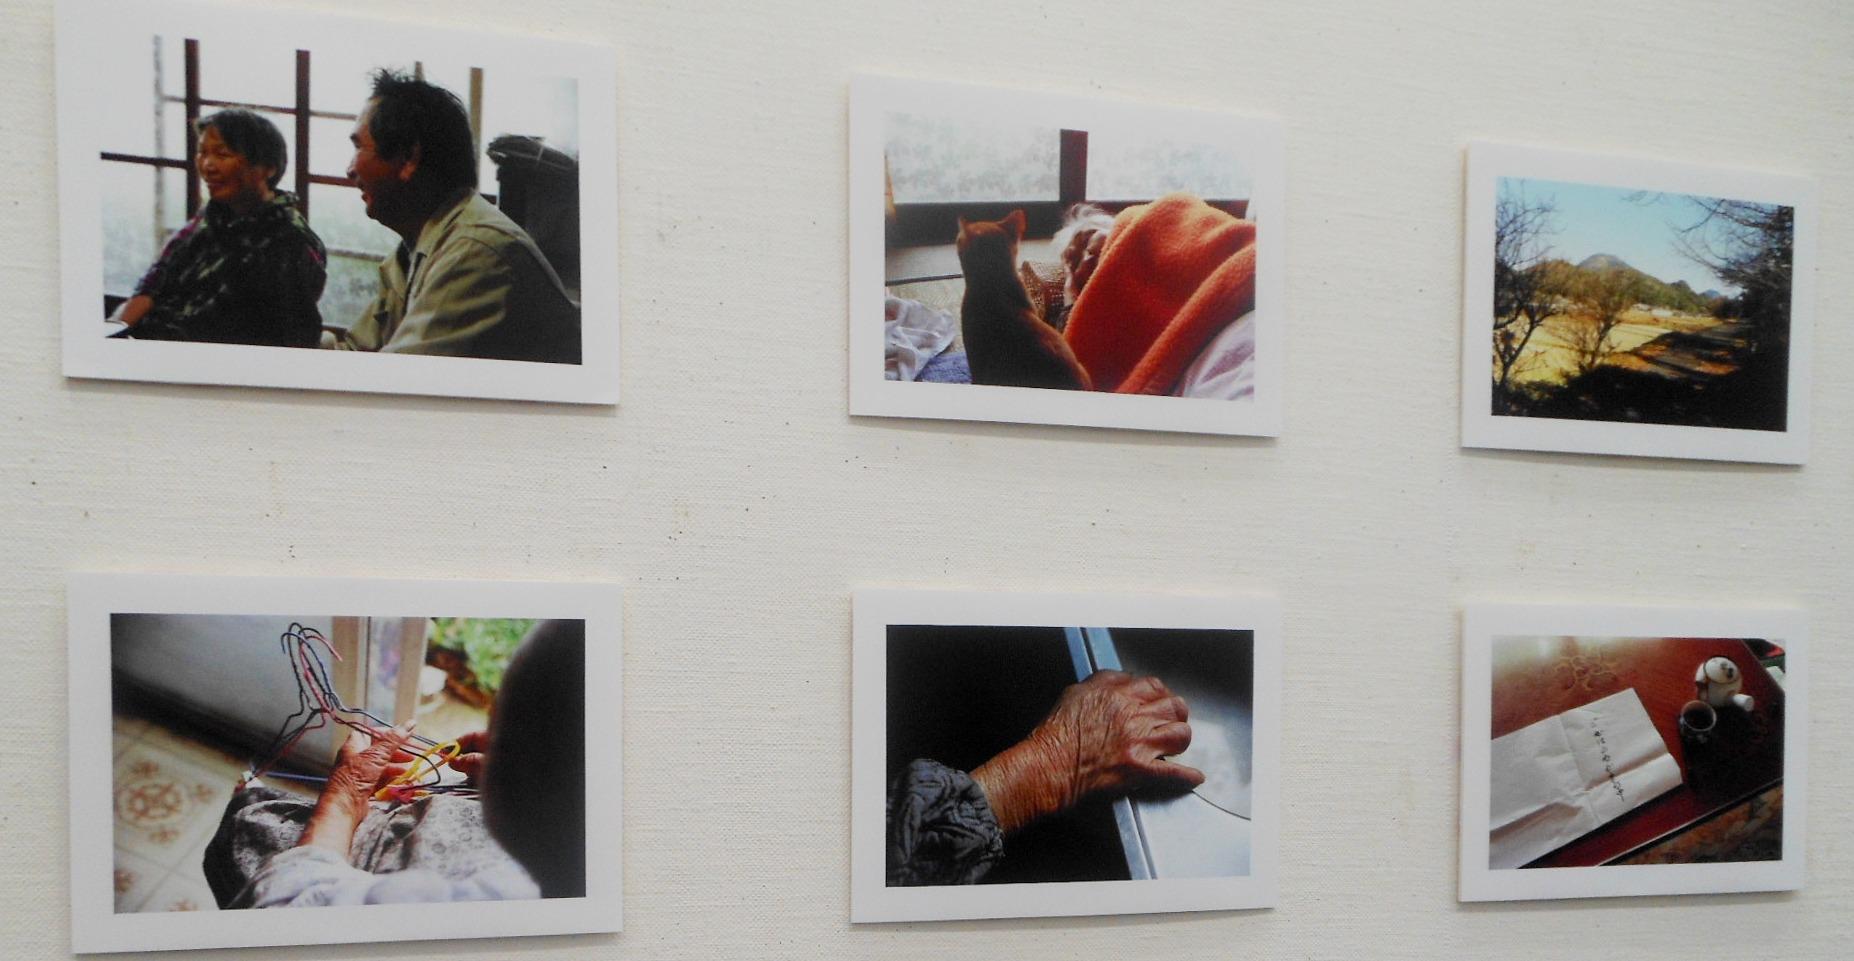 1888)③「写真クラブ「BePHaT!!」 第9回作品展 『夢 Photo 2012』」市民g. 終了11月21日(水)~11月25日(日)_f0126829_0581288.jpg